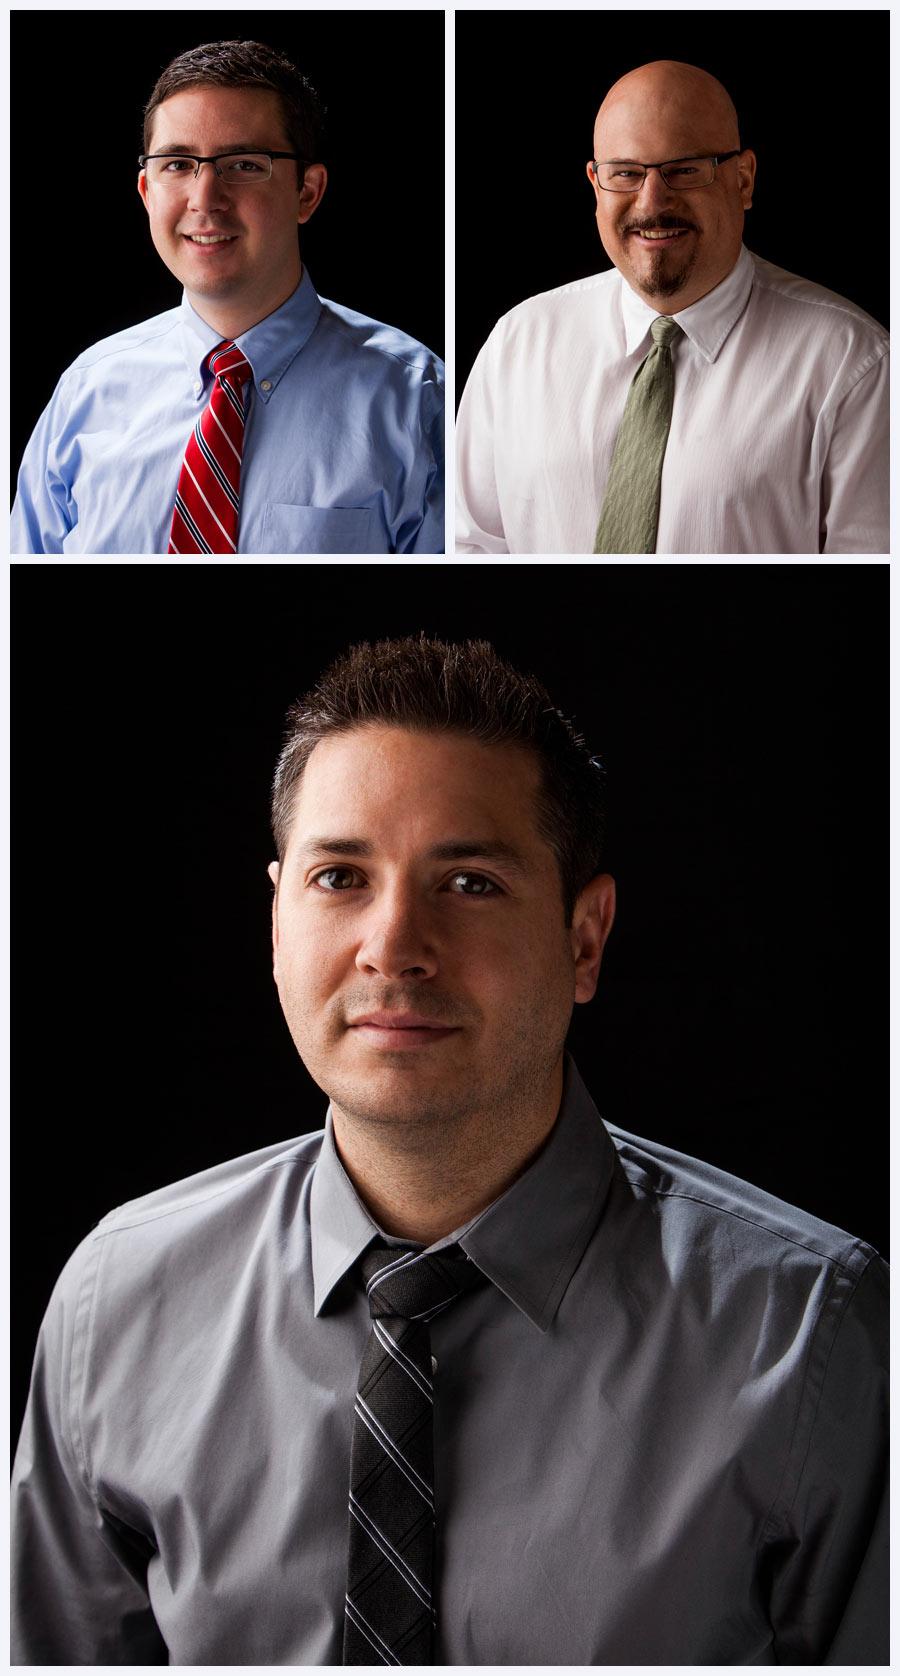 Tucson Photographer Innova Group Professional Portrait Session